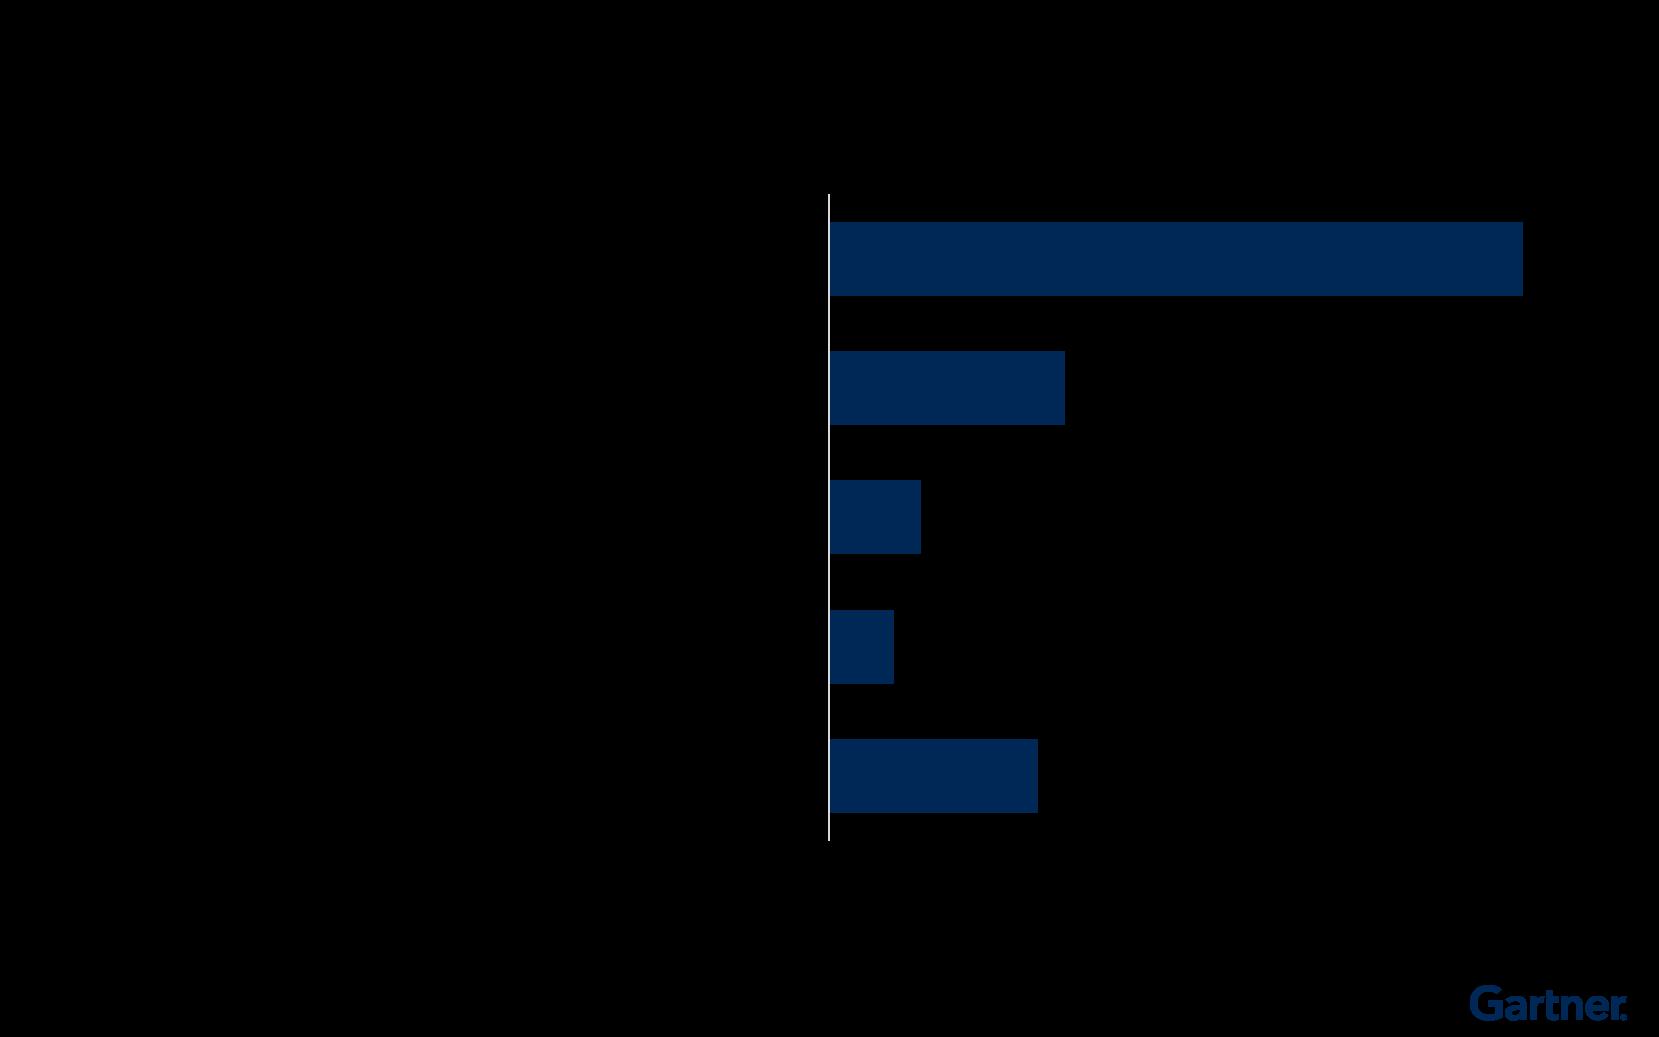 Figure 2: Changes to R&D's Scenario Planning Process